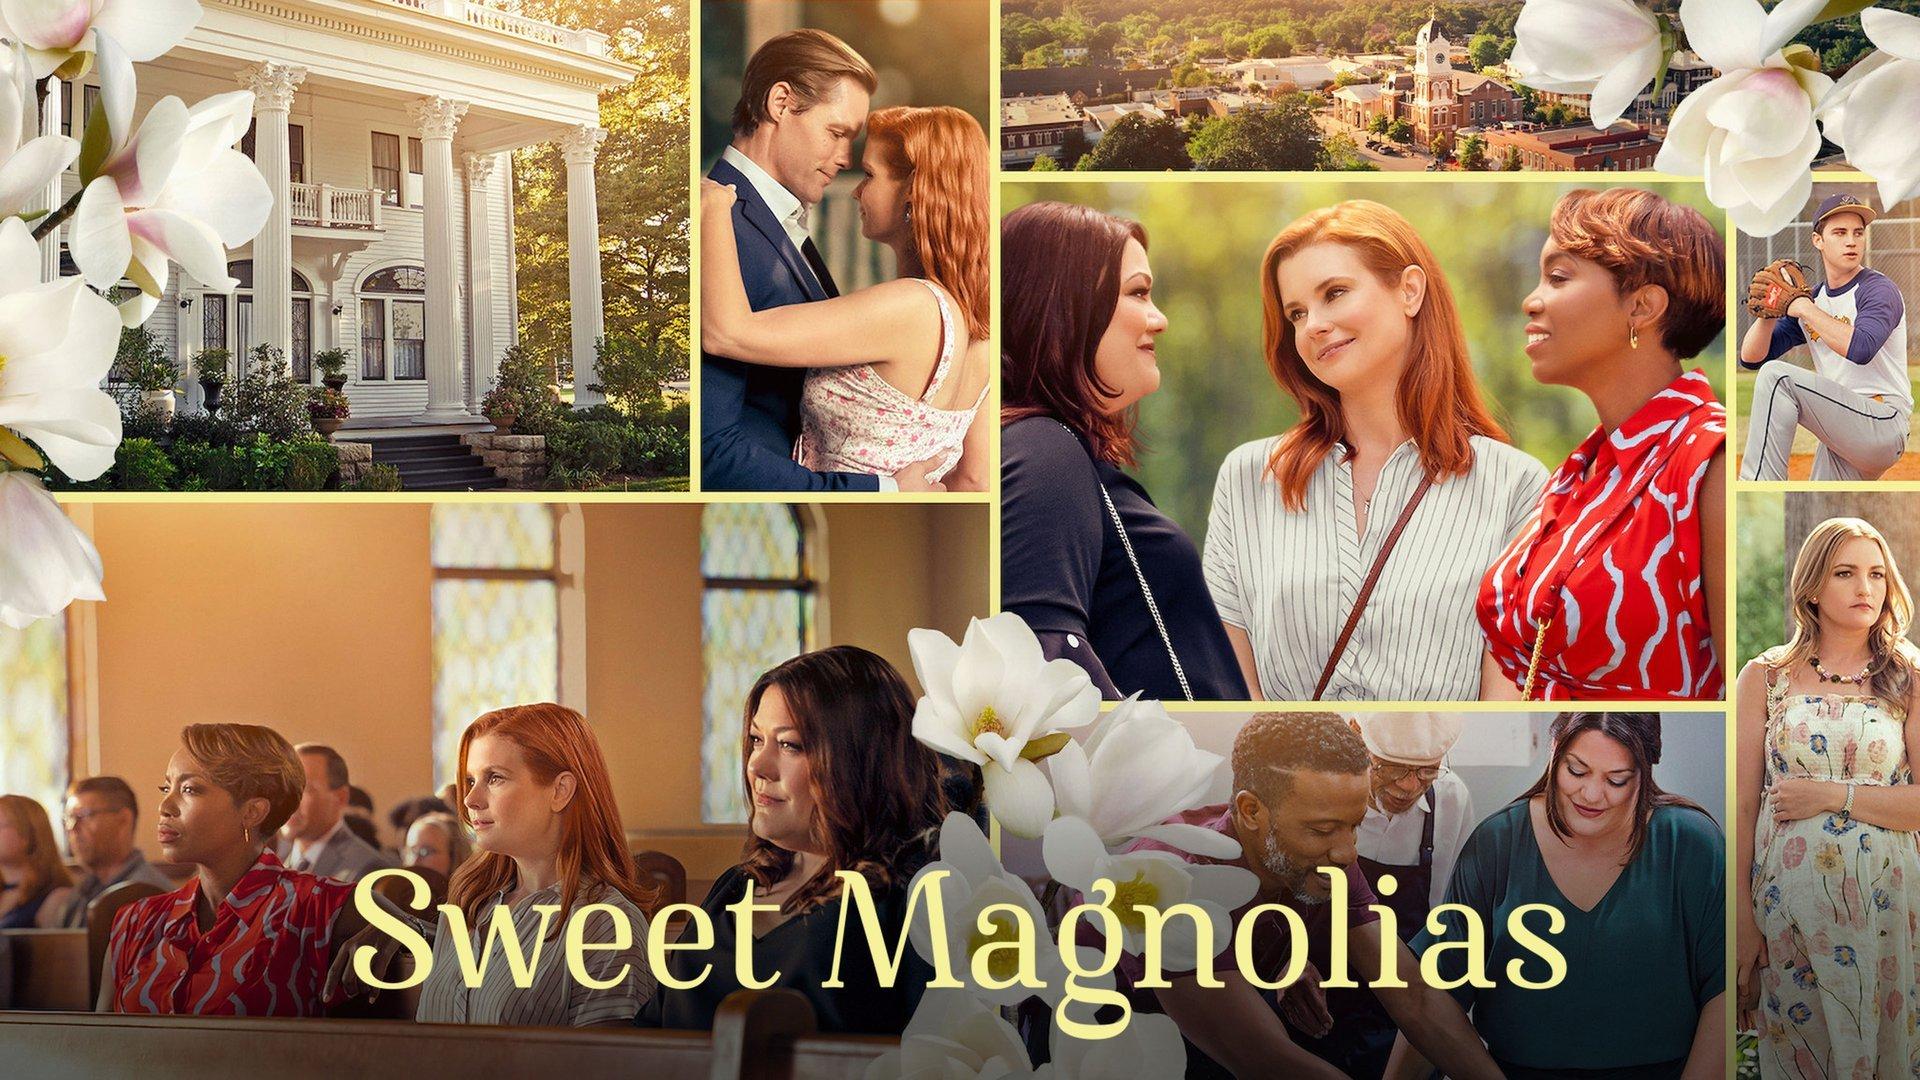 Sweet Magnolias - Netflix